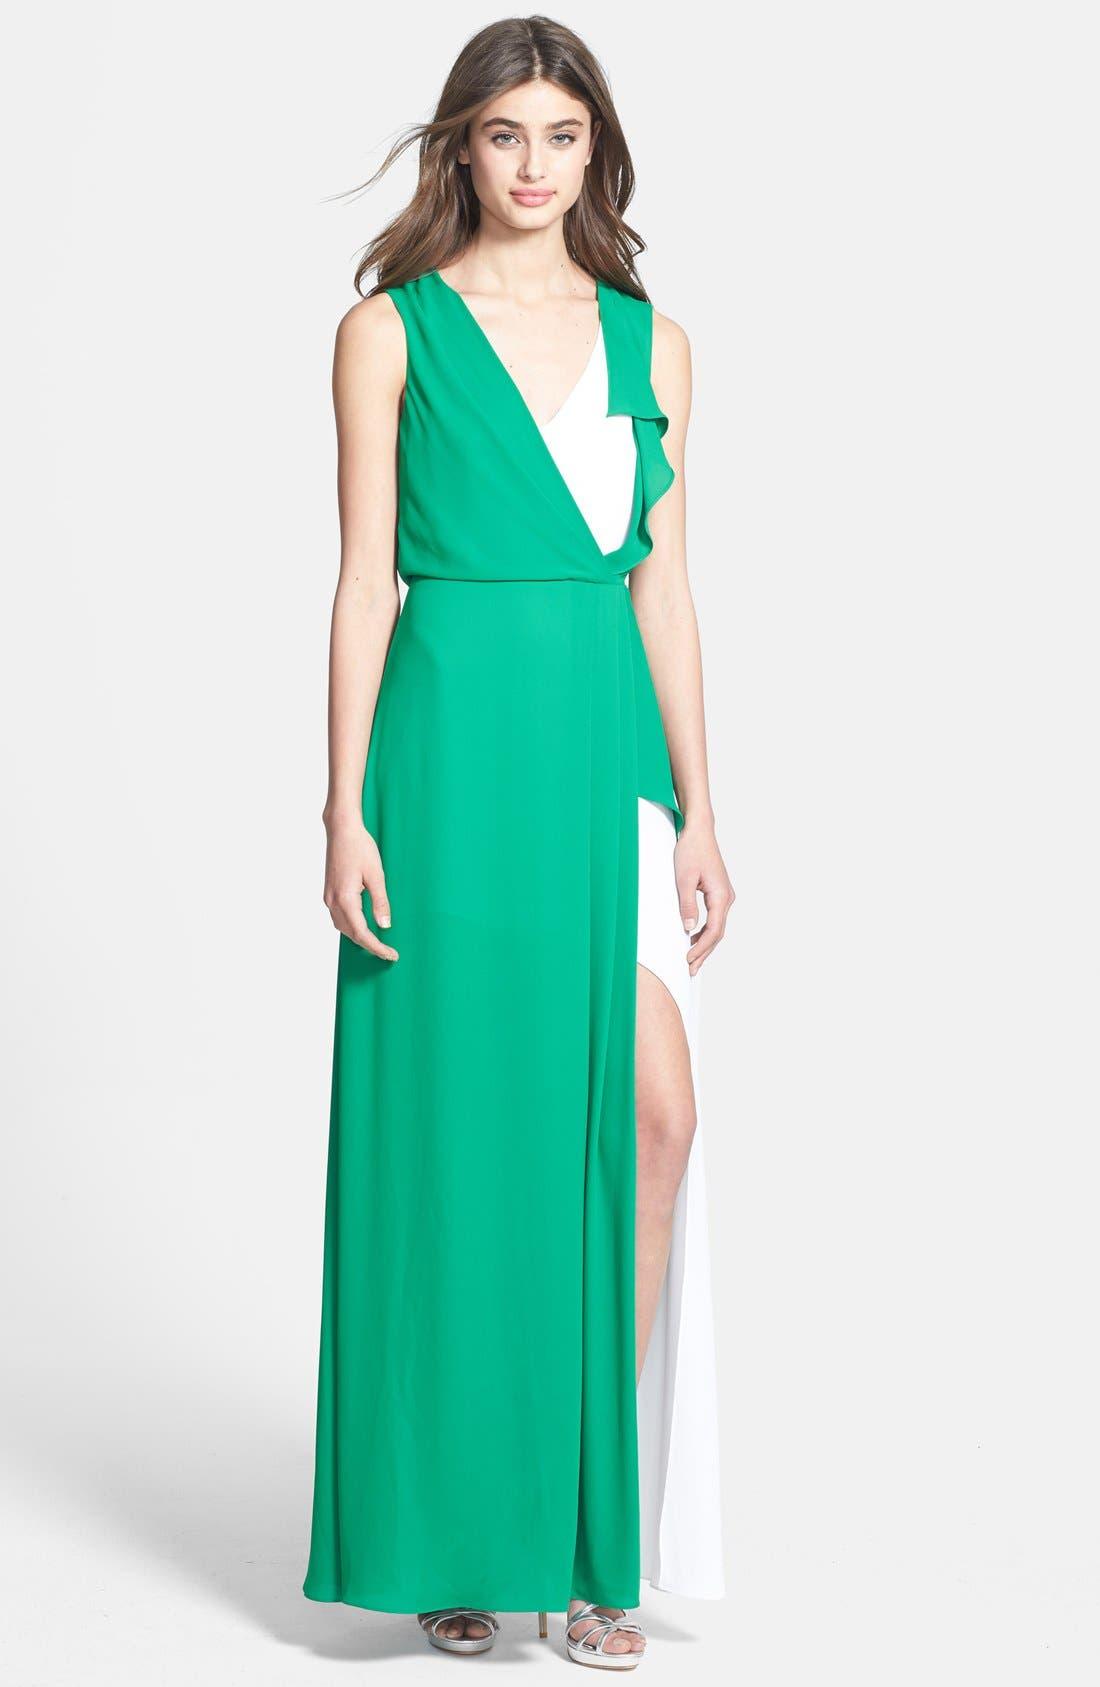 Main Image - BCBGMAXAZRIA 'Yuliana' Contrast Inset Gown